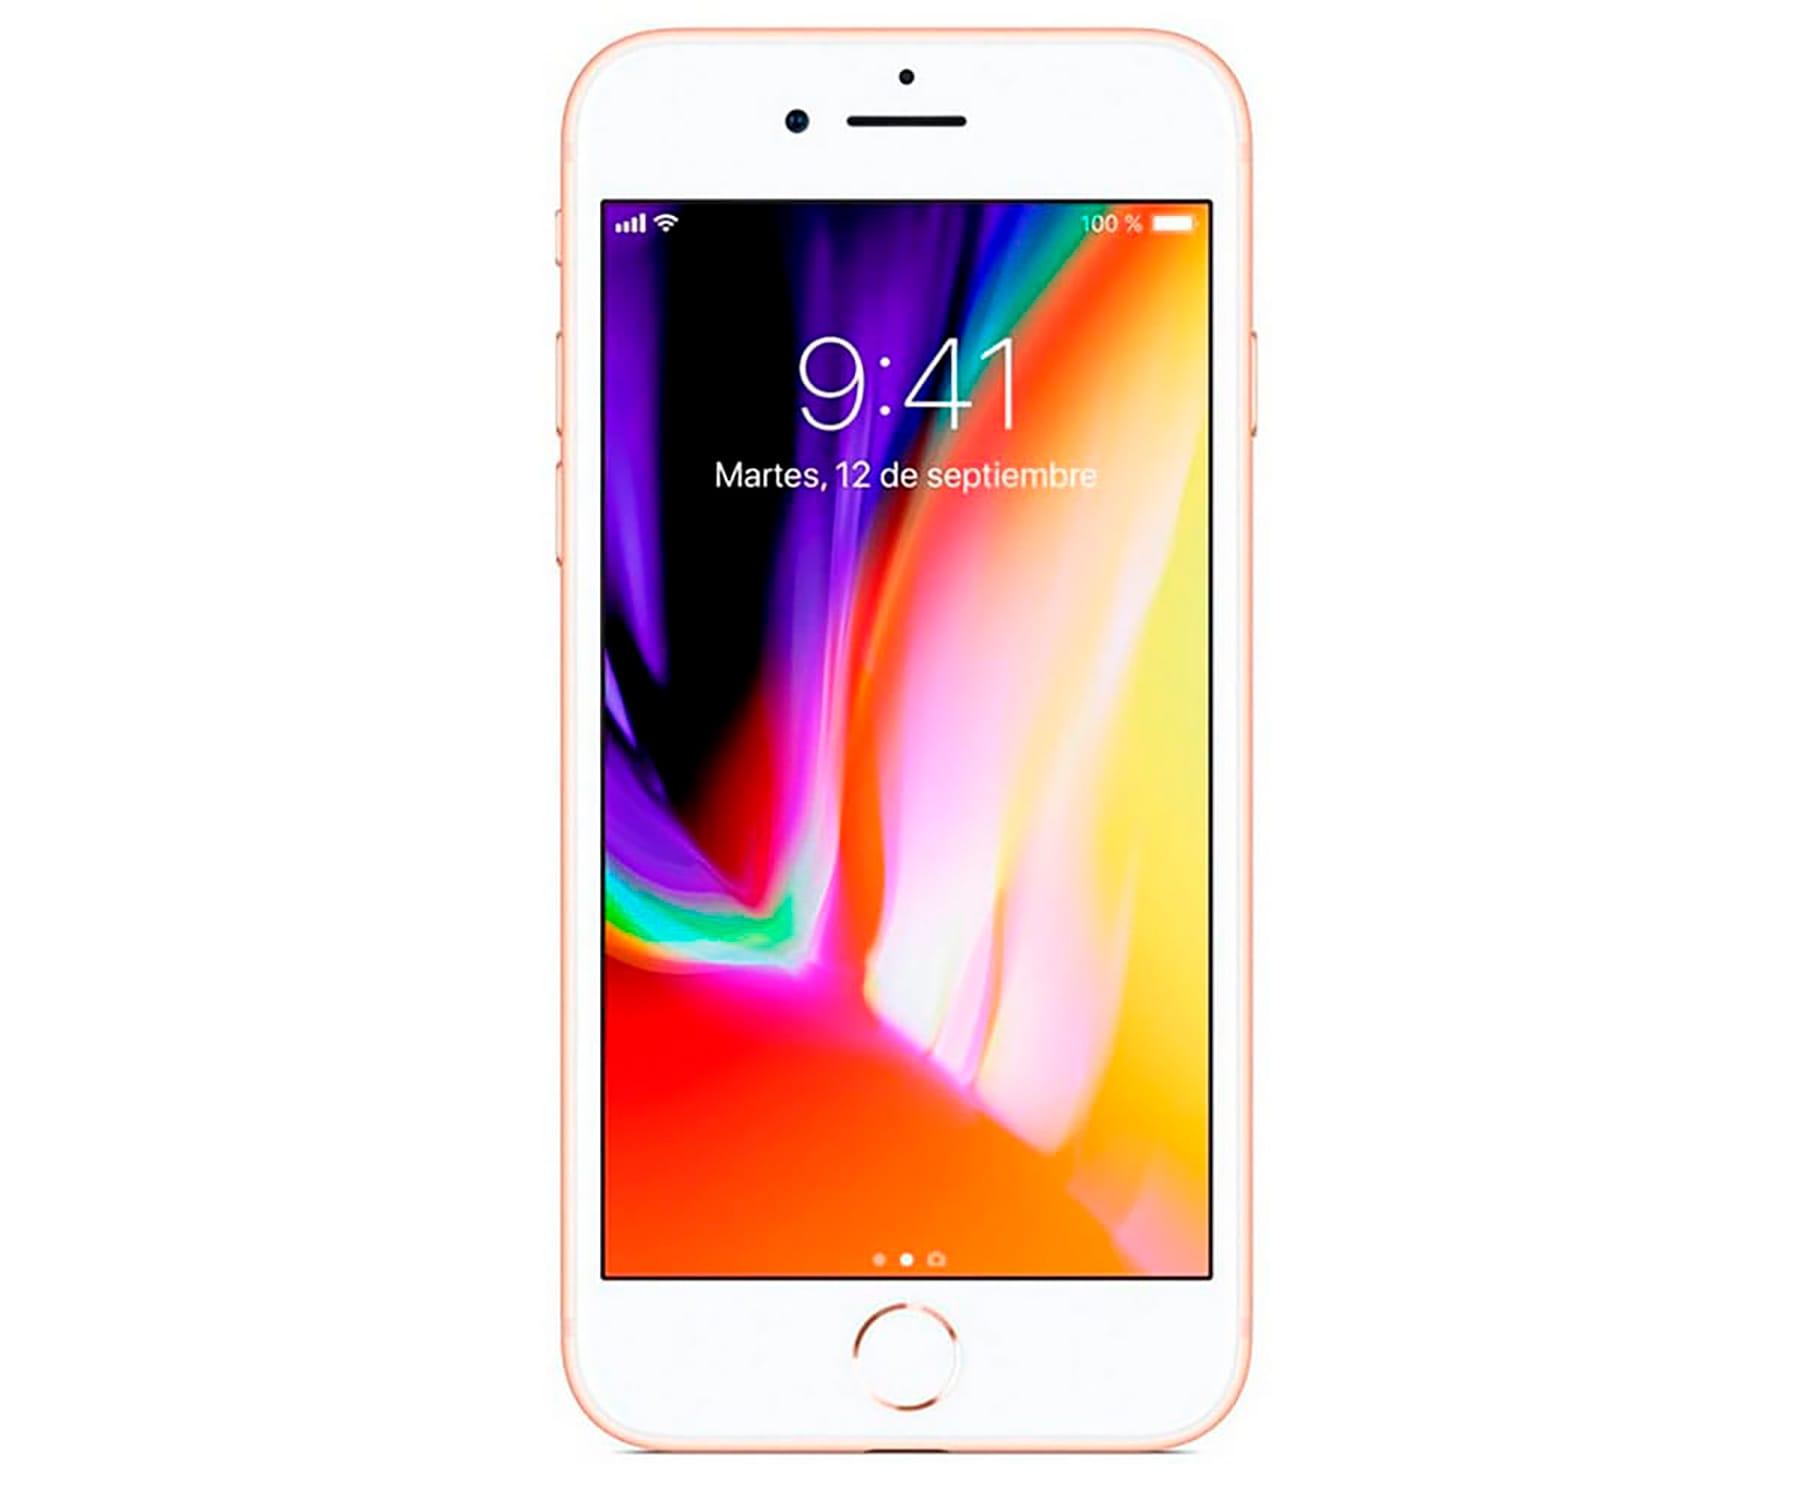 426aaf0a1de ... APPLE IPHONE 8 64GB ORO REACONDICIONADO CPO MÓVIL 4G 4.7'' RETINA  HD/6CORE ...